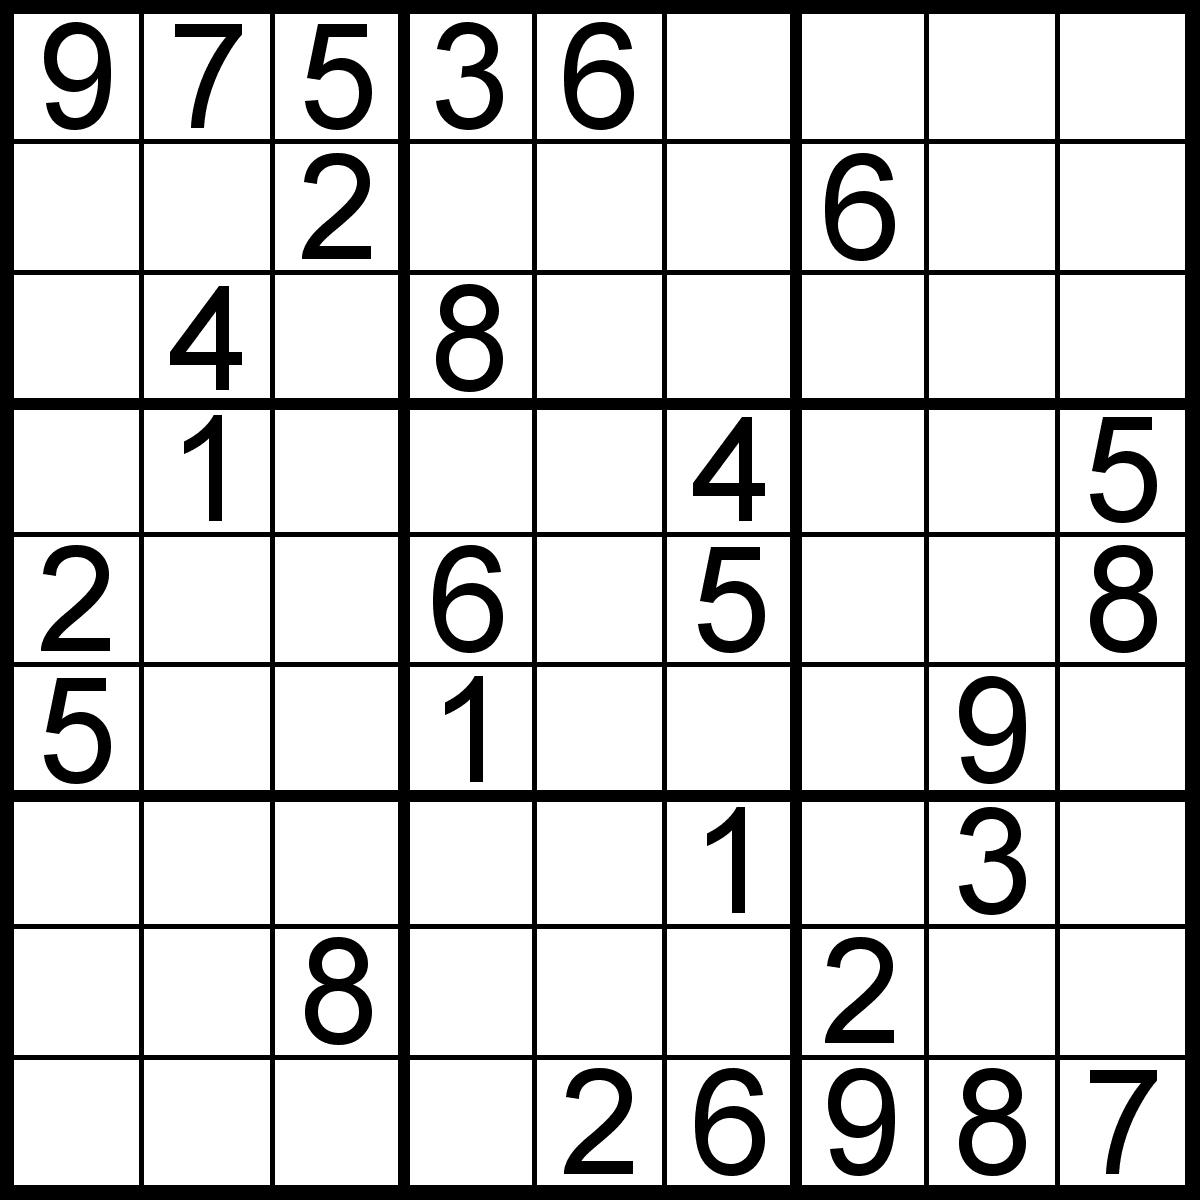 Sudoku Puzzles | Brain Teaser Called Sudoku Puzzles | Sudoku